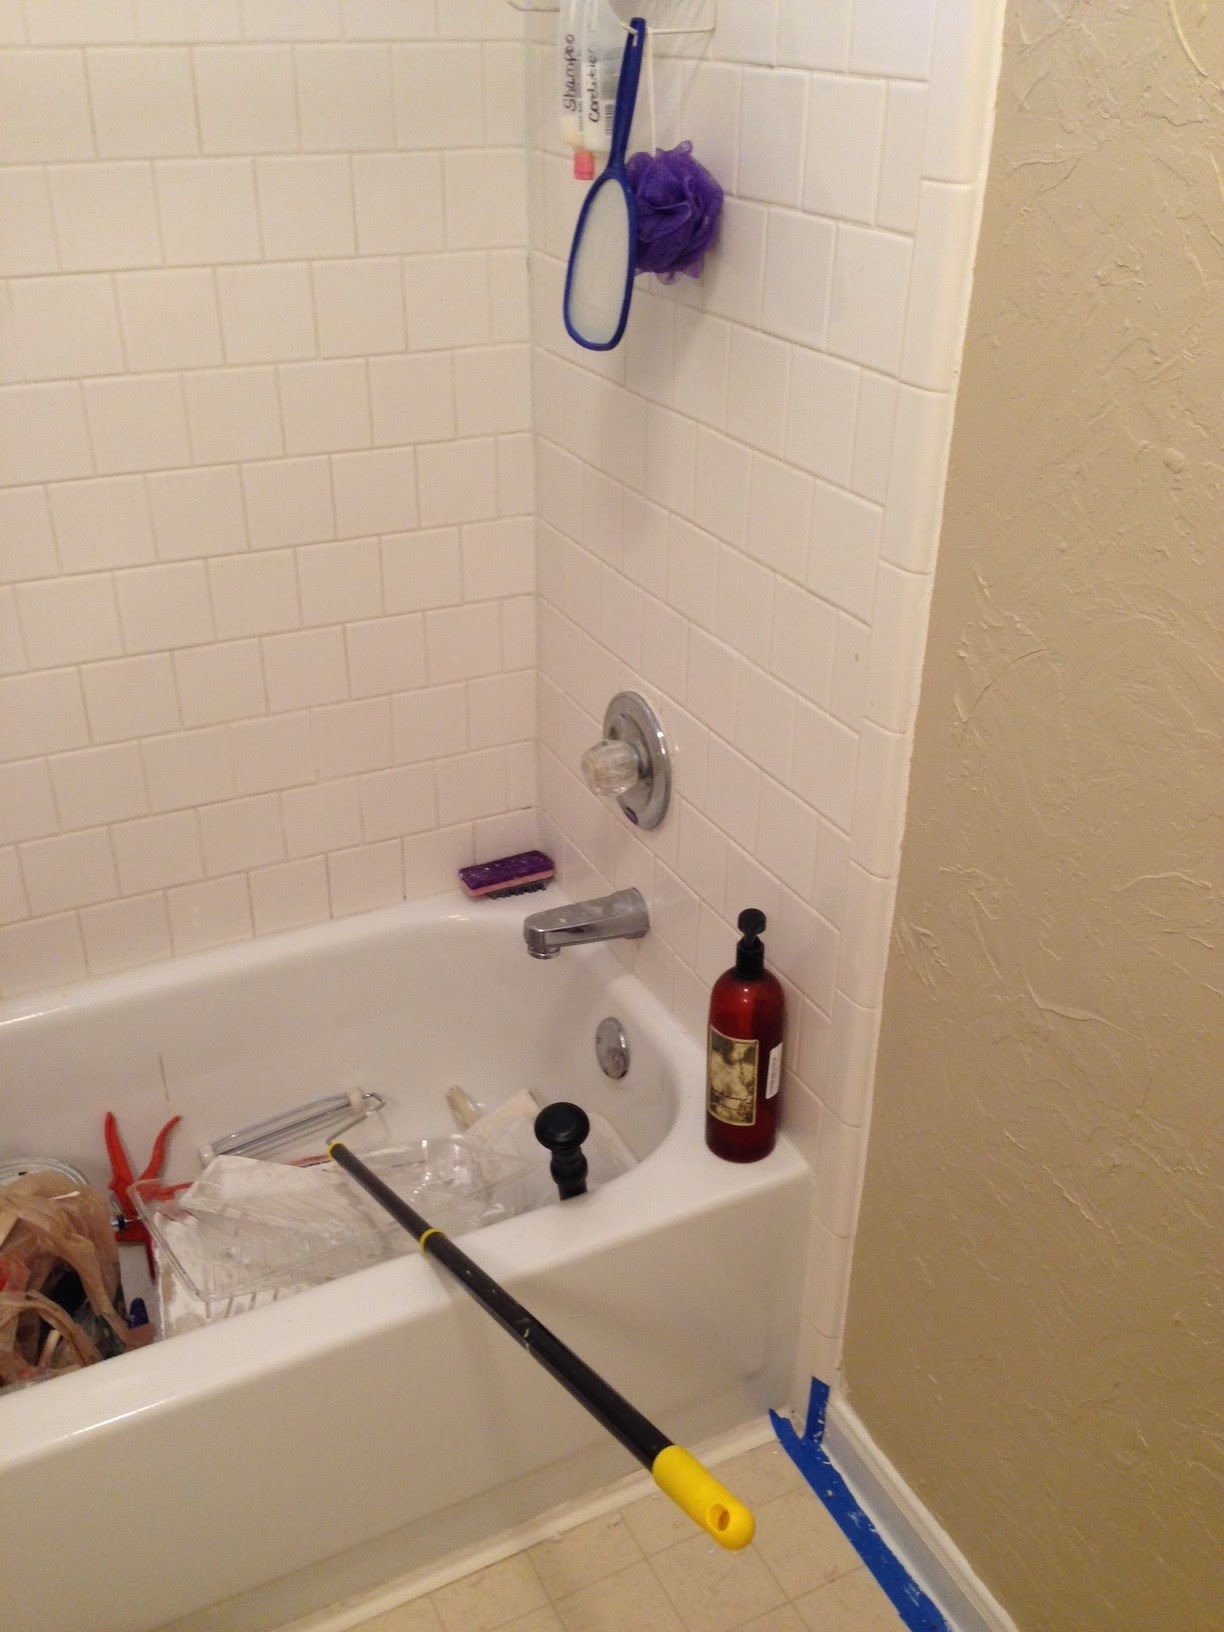 Home Depot Bathroom Flooring Ideas: Home Depot Windsor Toilets